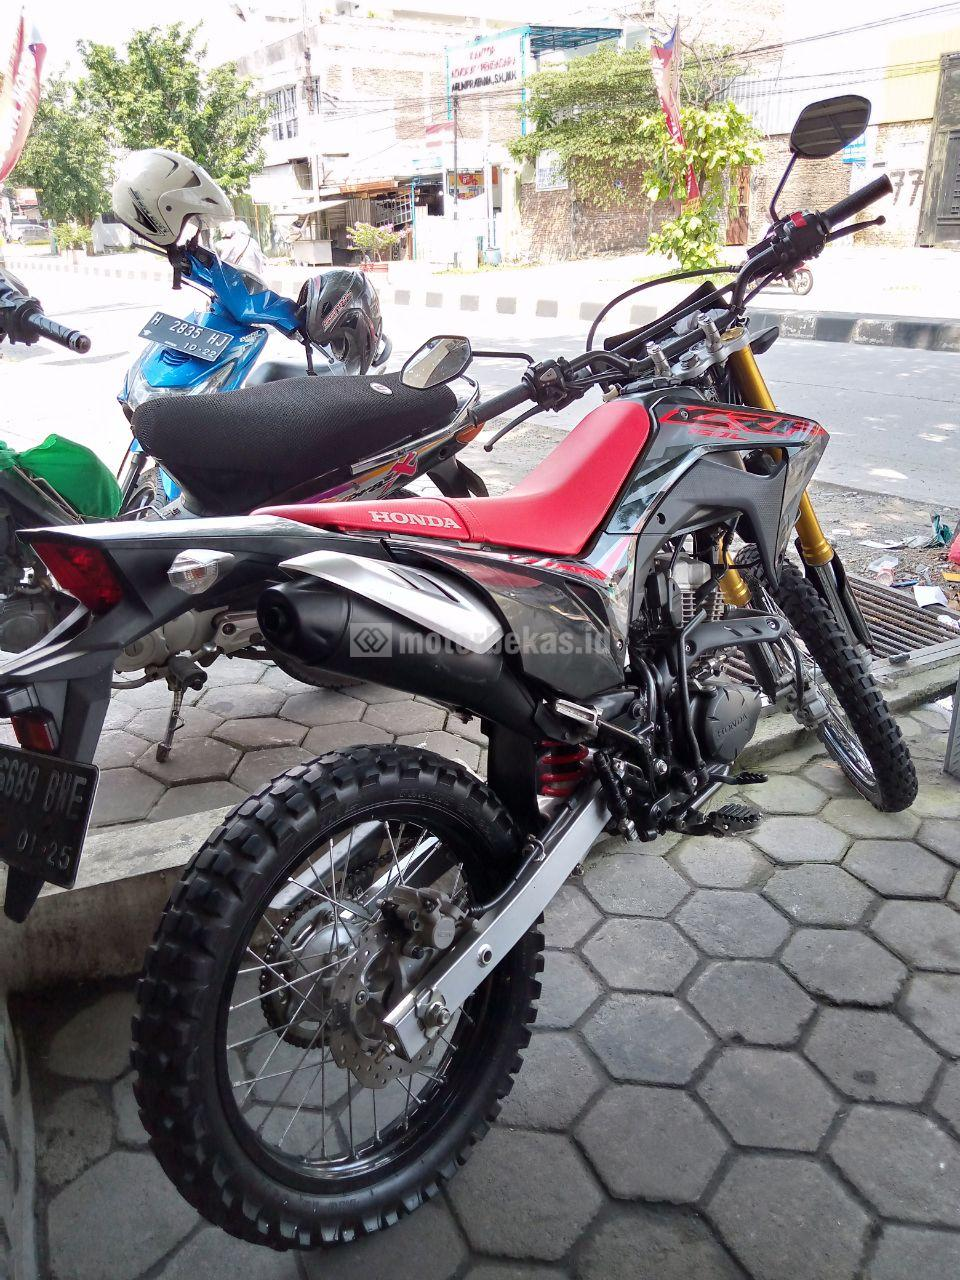 HONDA CRF 150L  1034 motorbekas.id